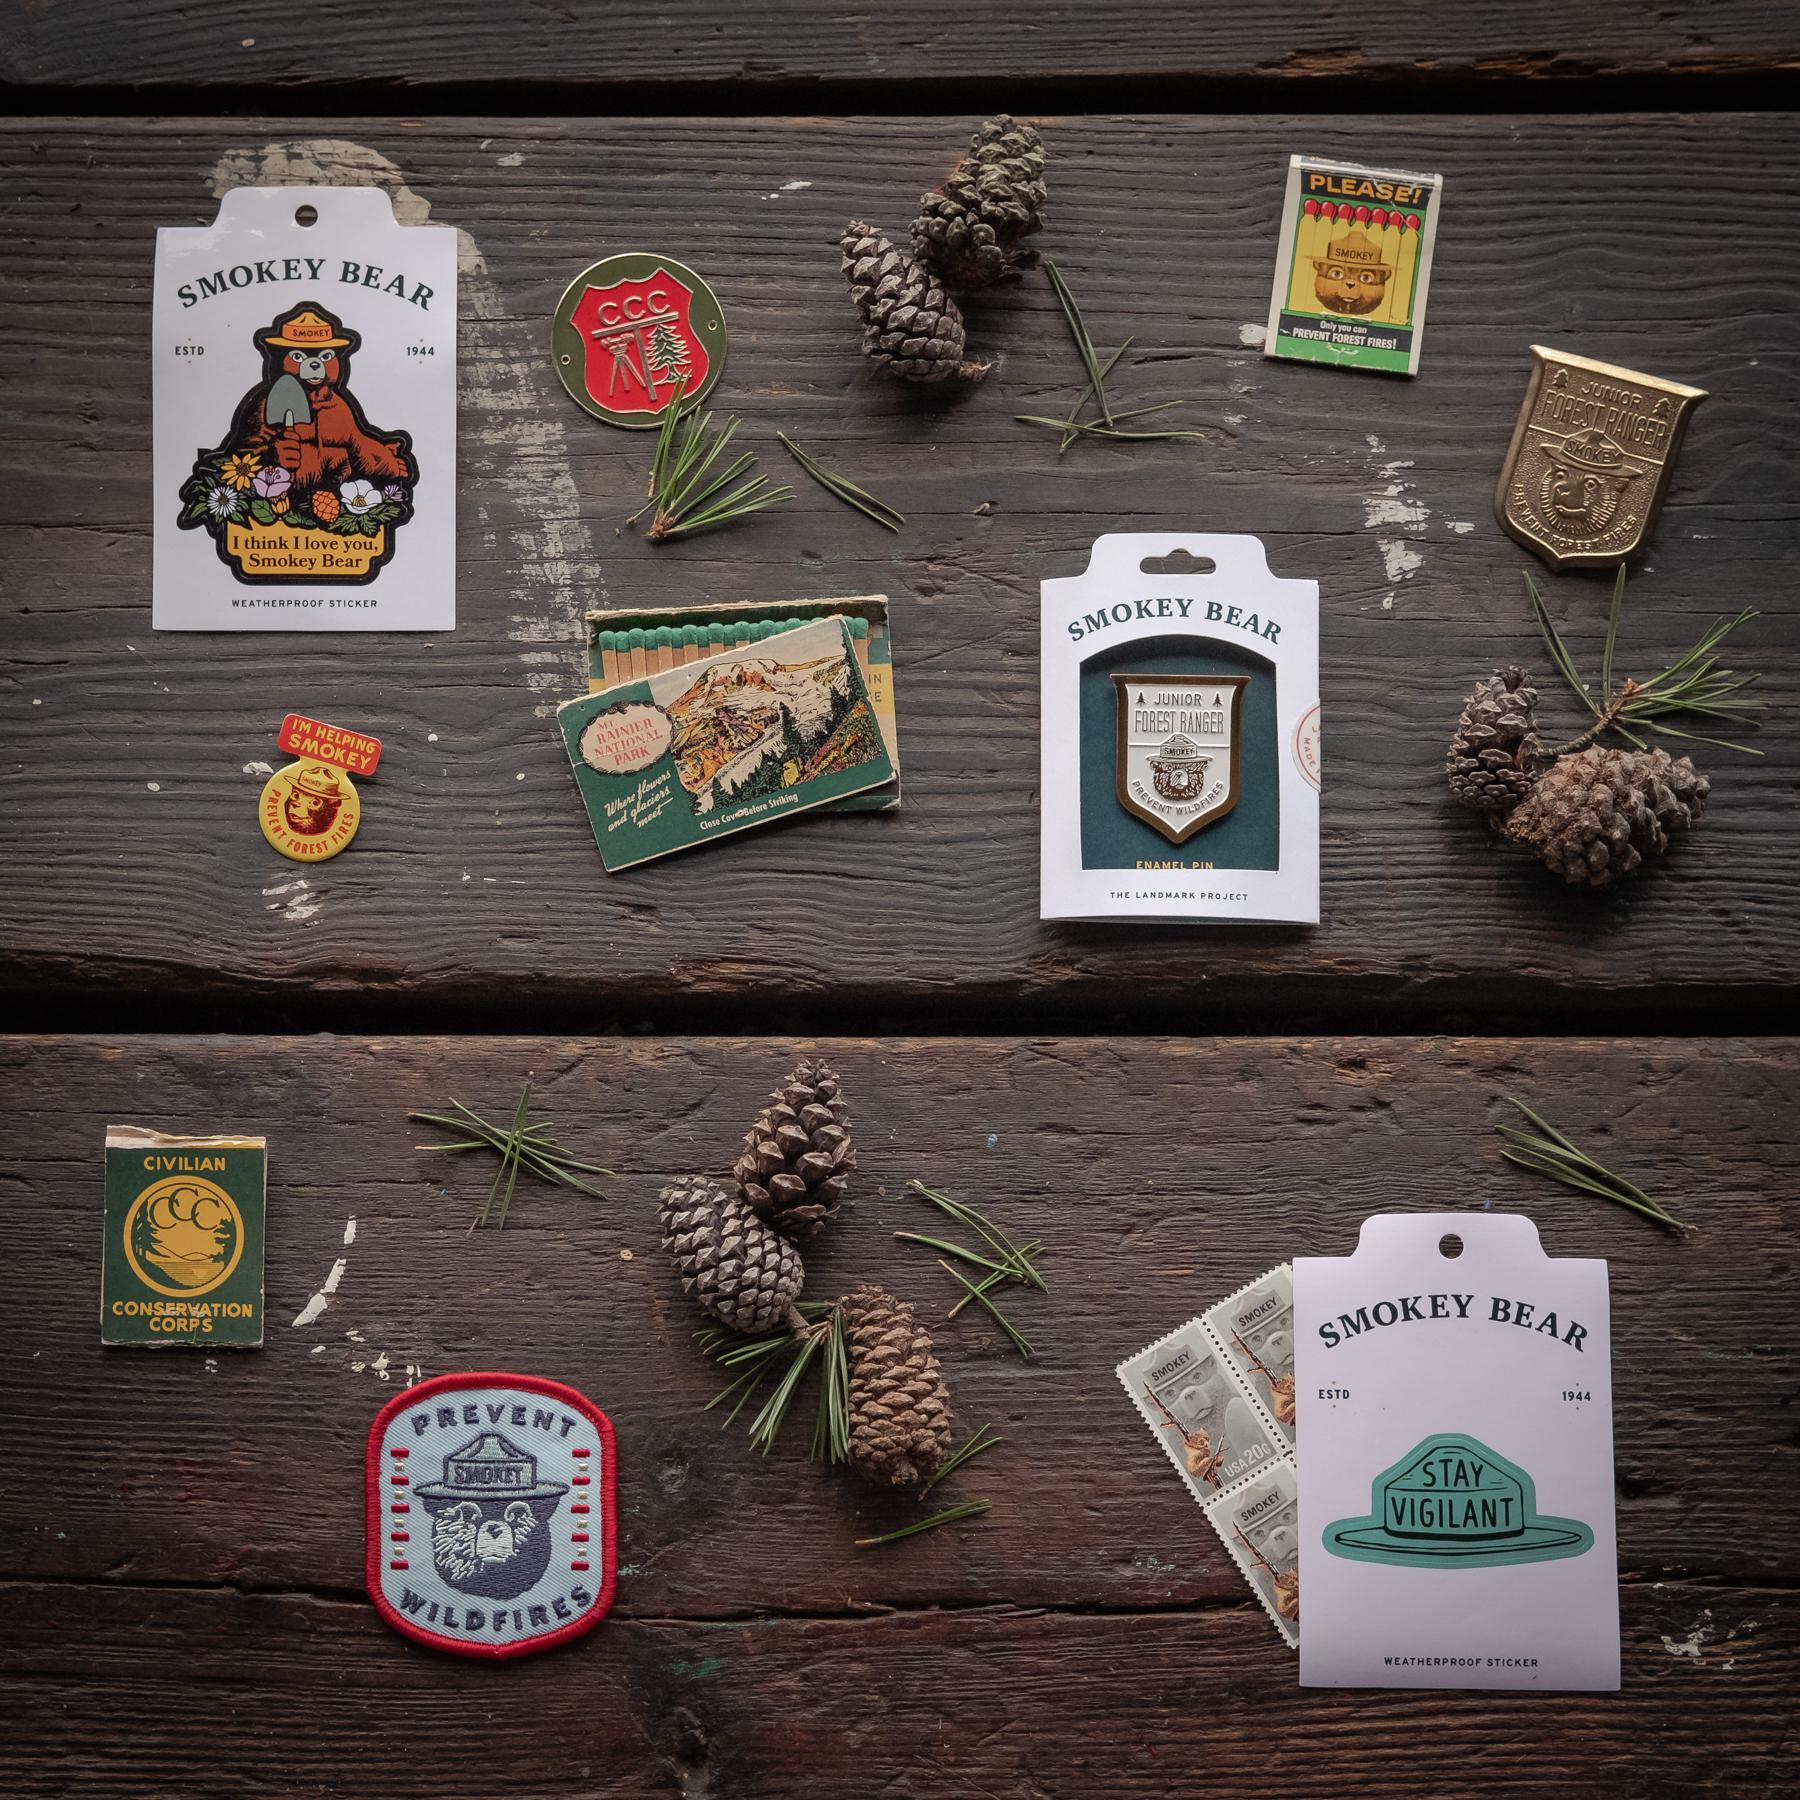 smokey-bear-patches-stickers-02.jpg